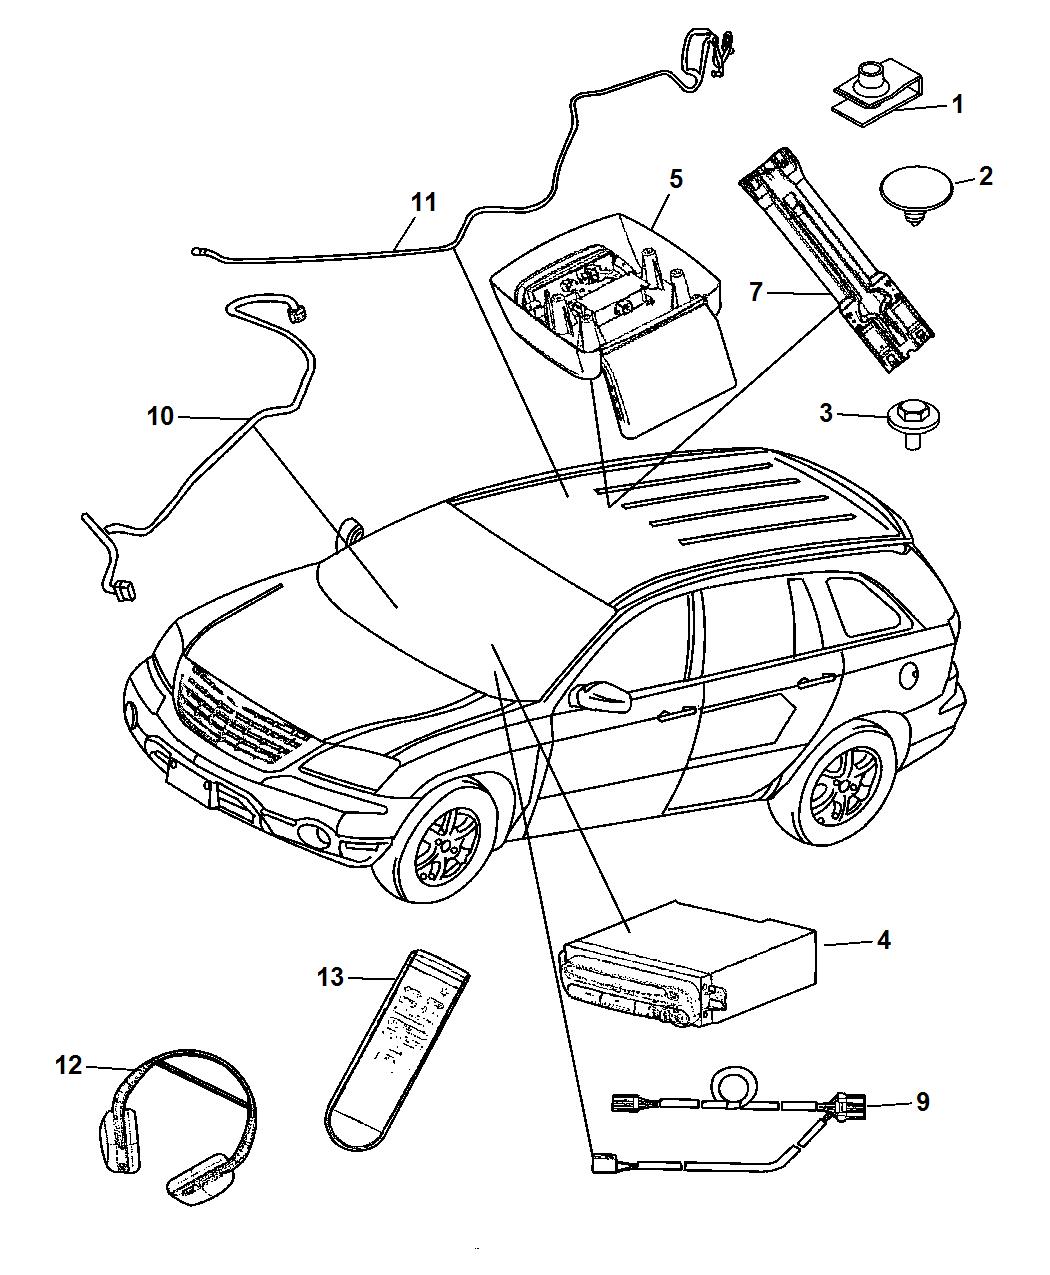 [SODI_2457]   05 Chrysler Pacifica Immobilizer Wiring Diagram - data wiring diagram | 05 Chrysler Pacifica Immobilizer Wiring Diagram |  | Edgar Hilsenrath